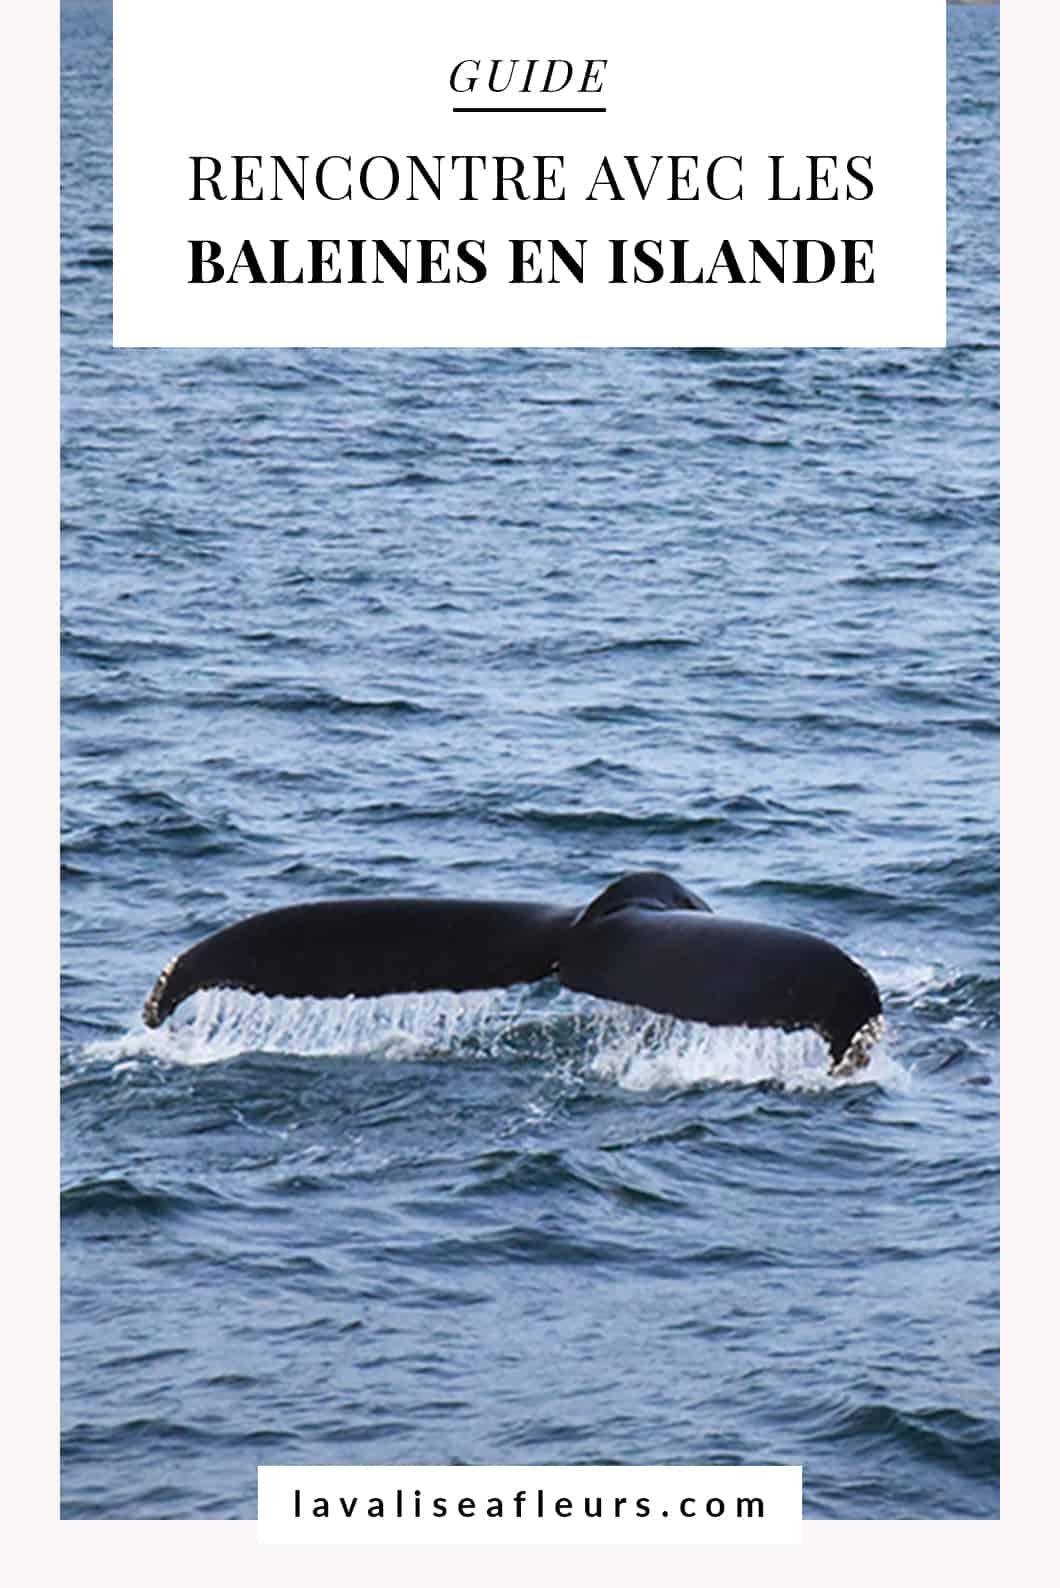 Rencontrer les baleines en Islande, le guide